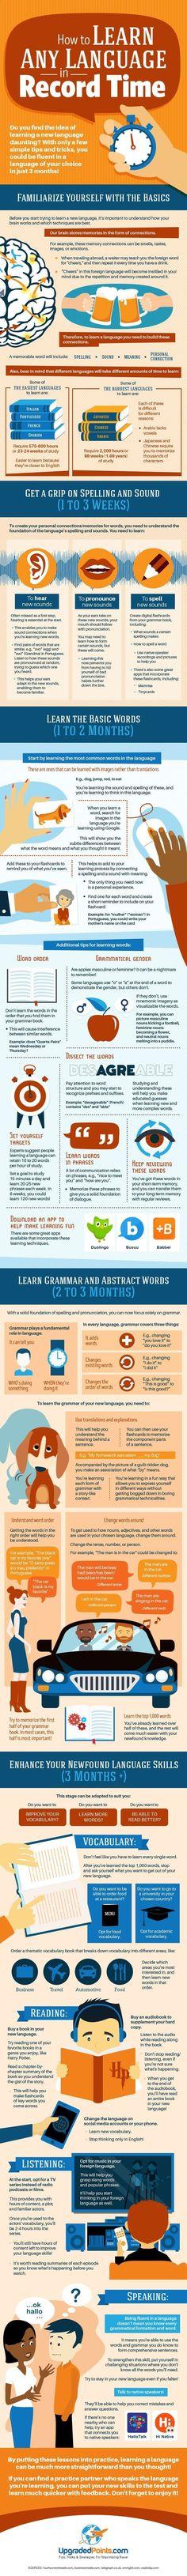 Learn a Language Fast #learnportuguese